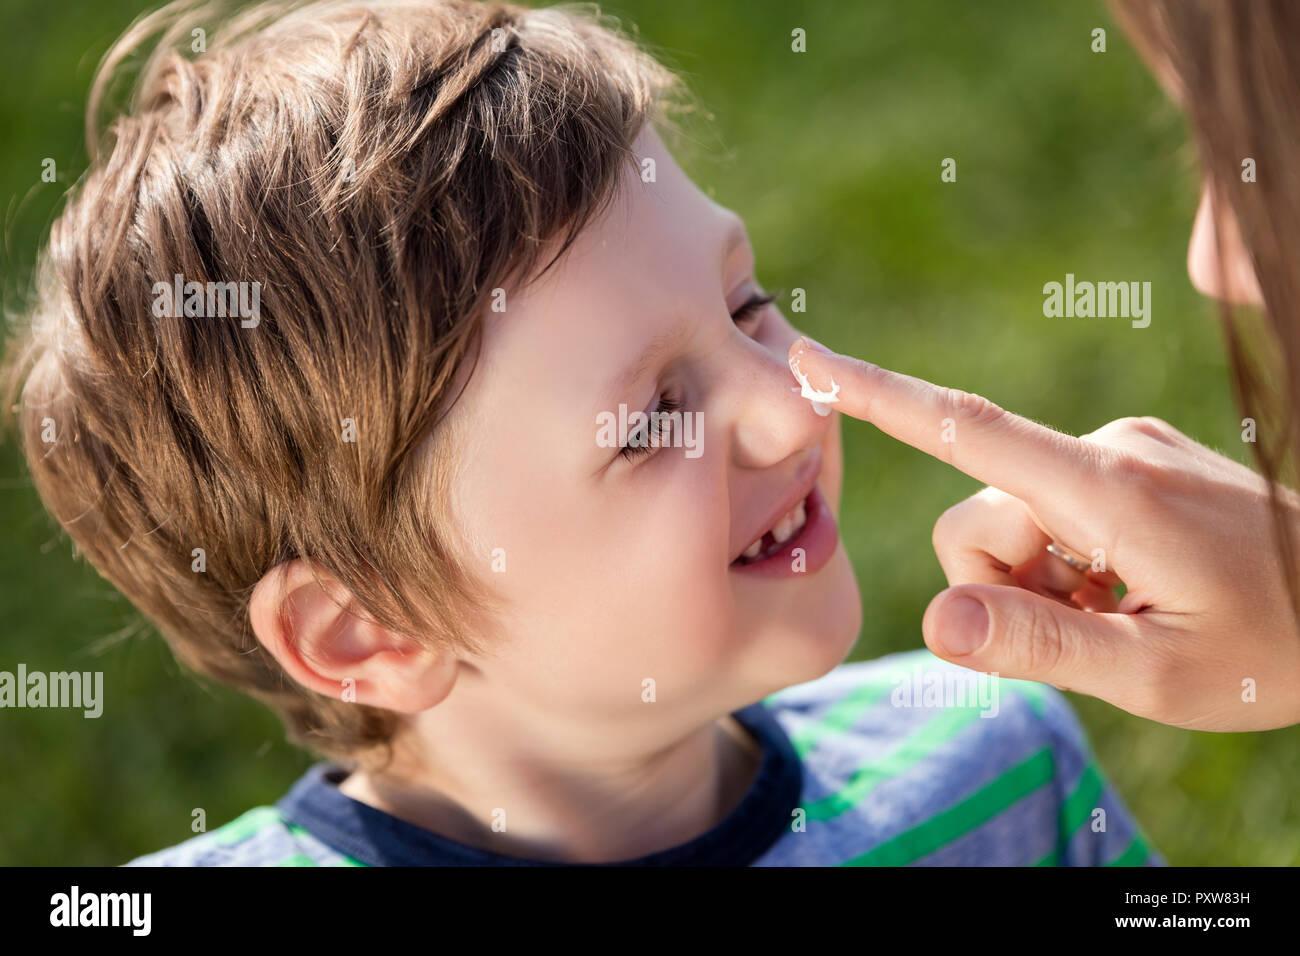 Mother applying suncream on son's nose - Stock Image